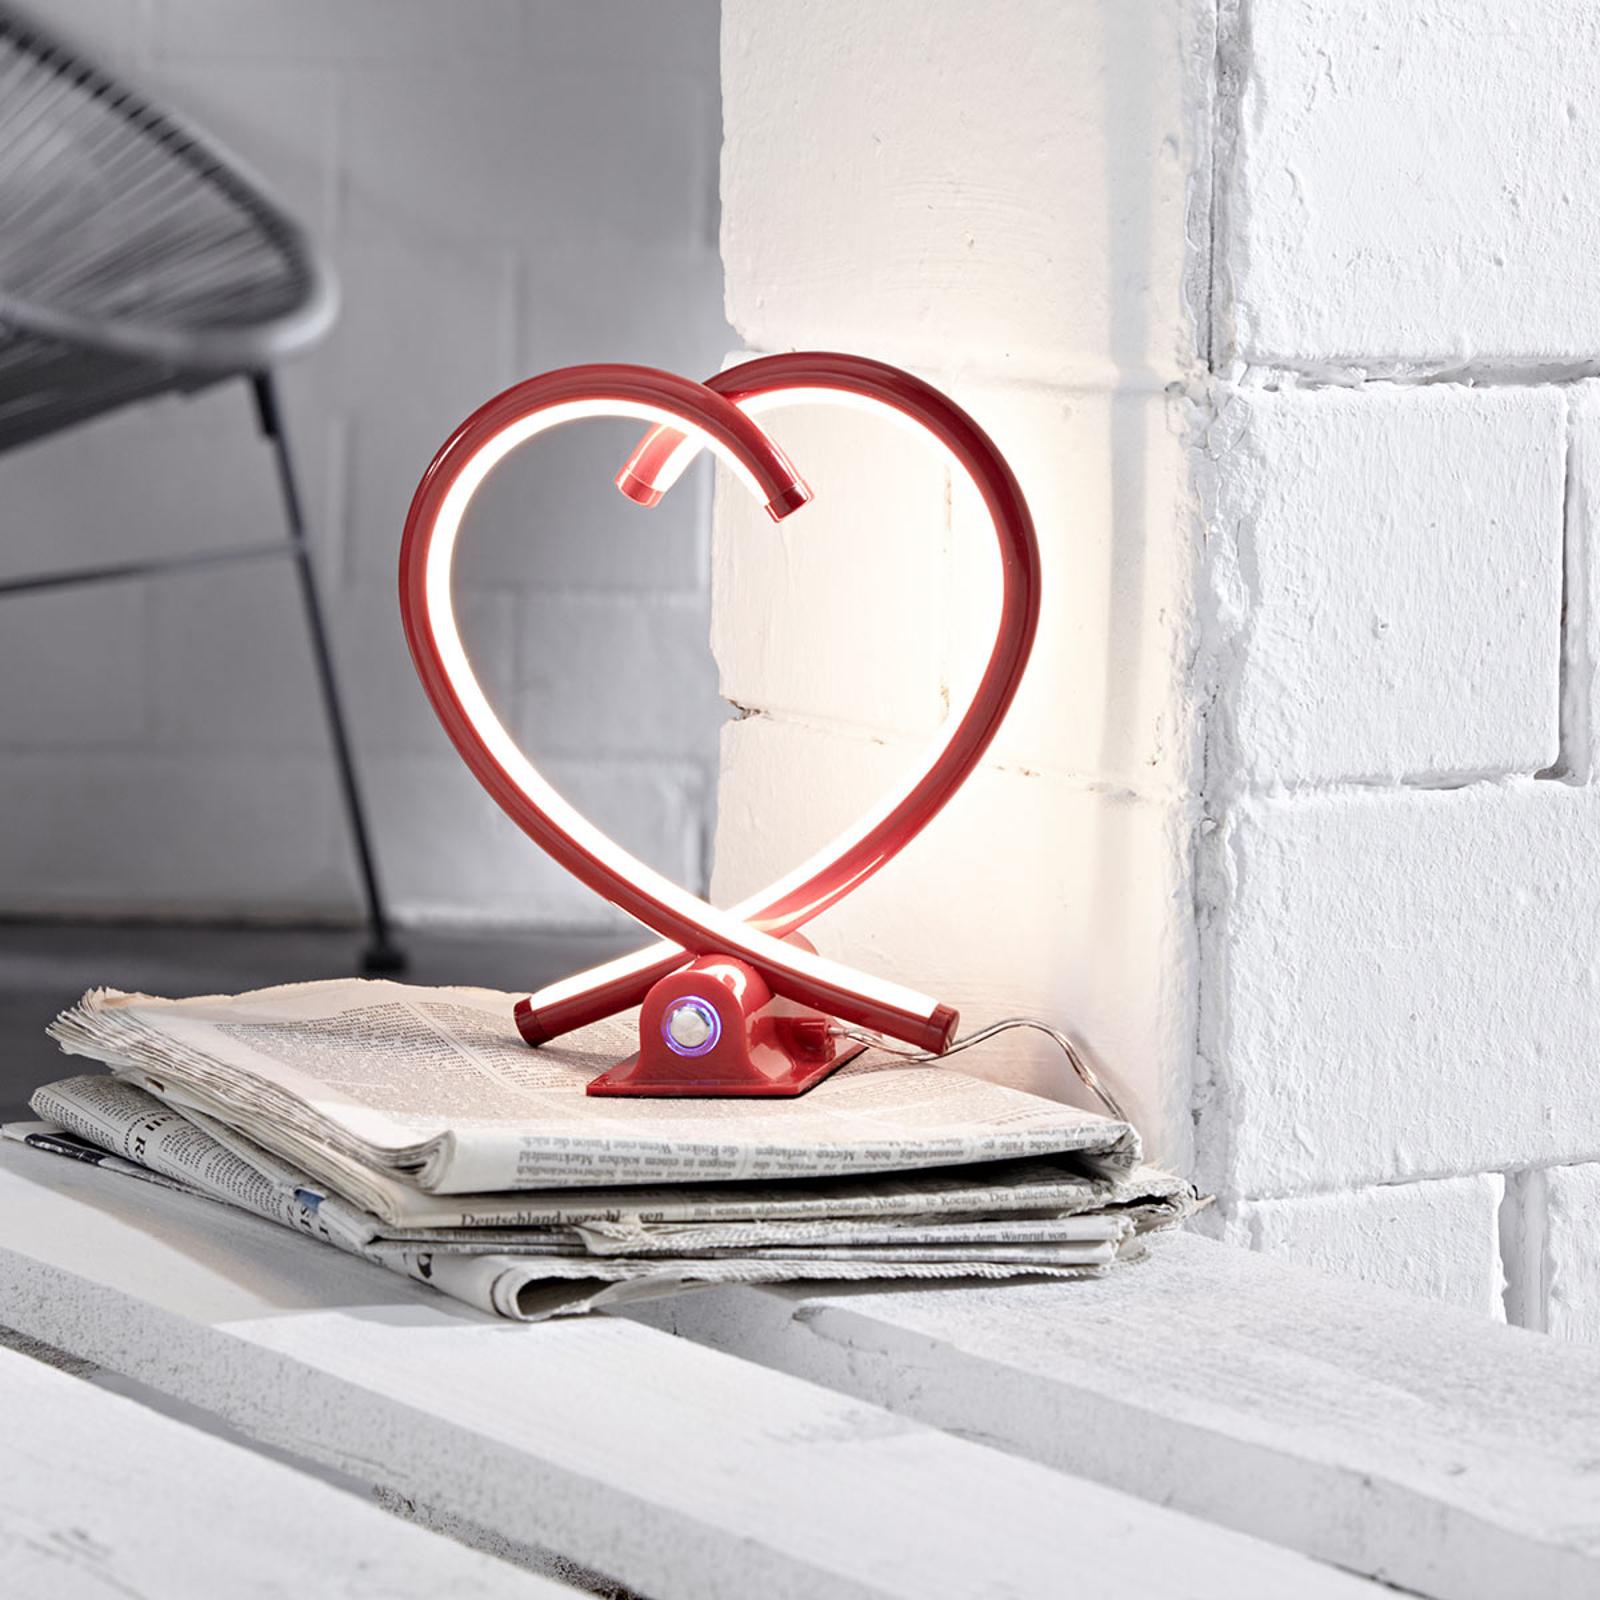 Herzförmige LED-Tischlampe Valentin in Rot